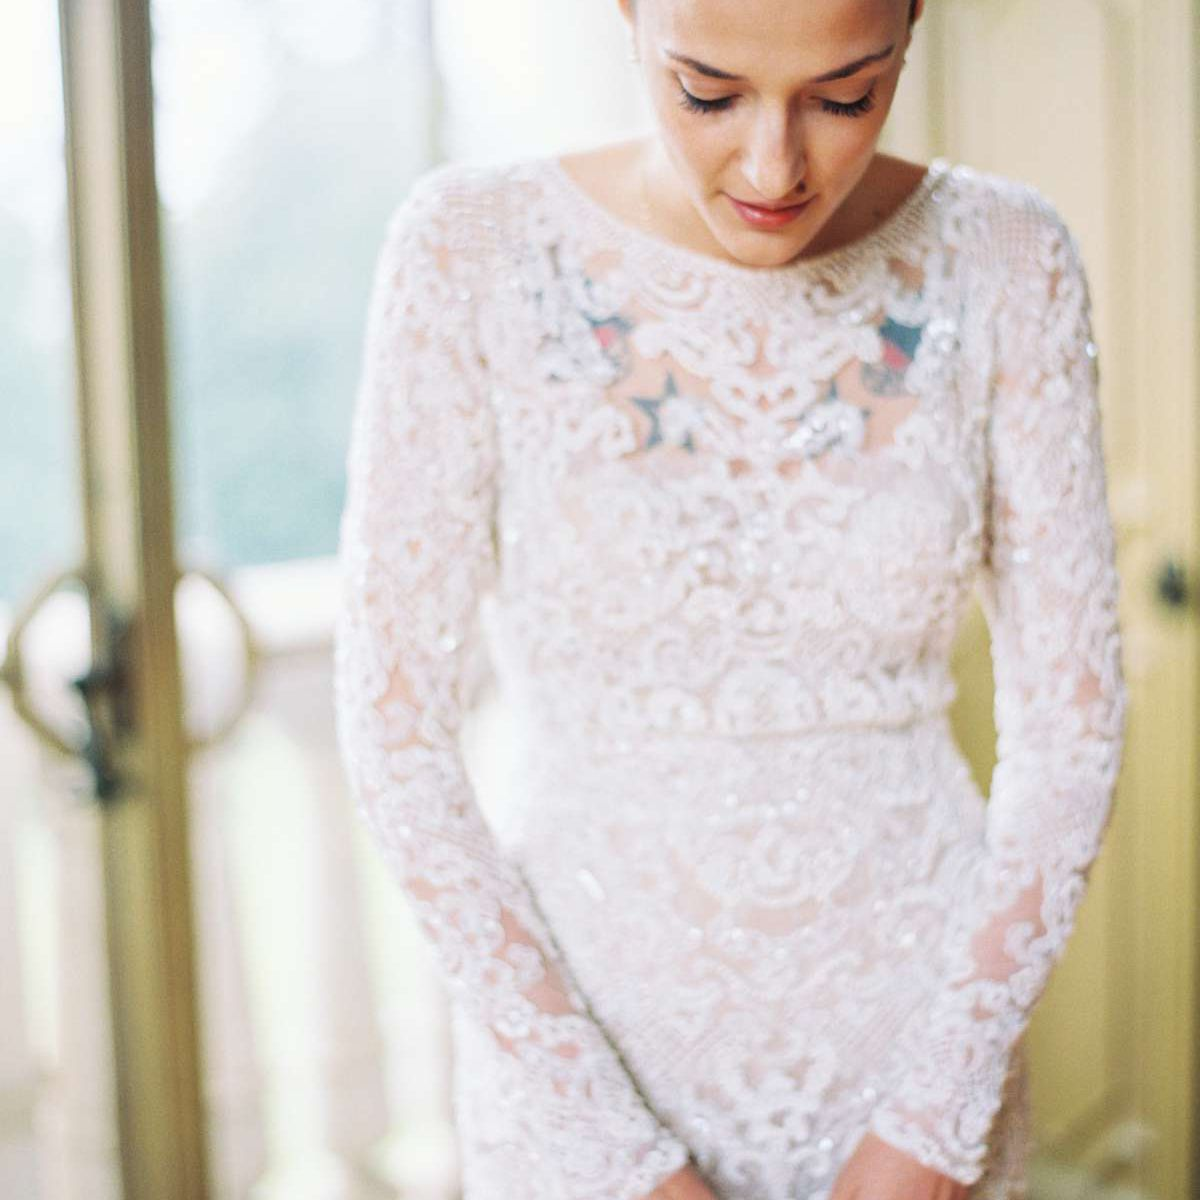 Tattooed bride wearing a sheer lace dress